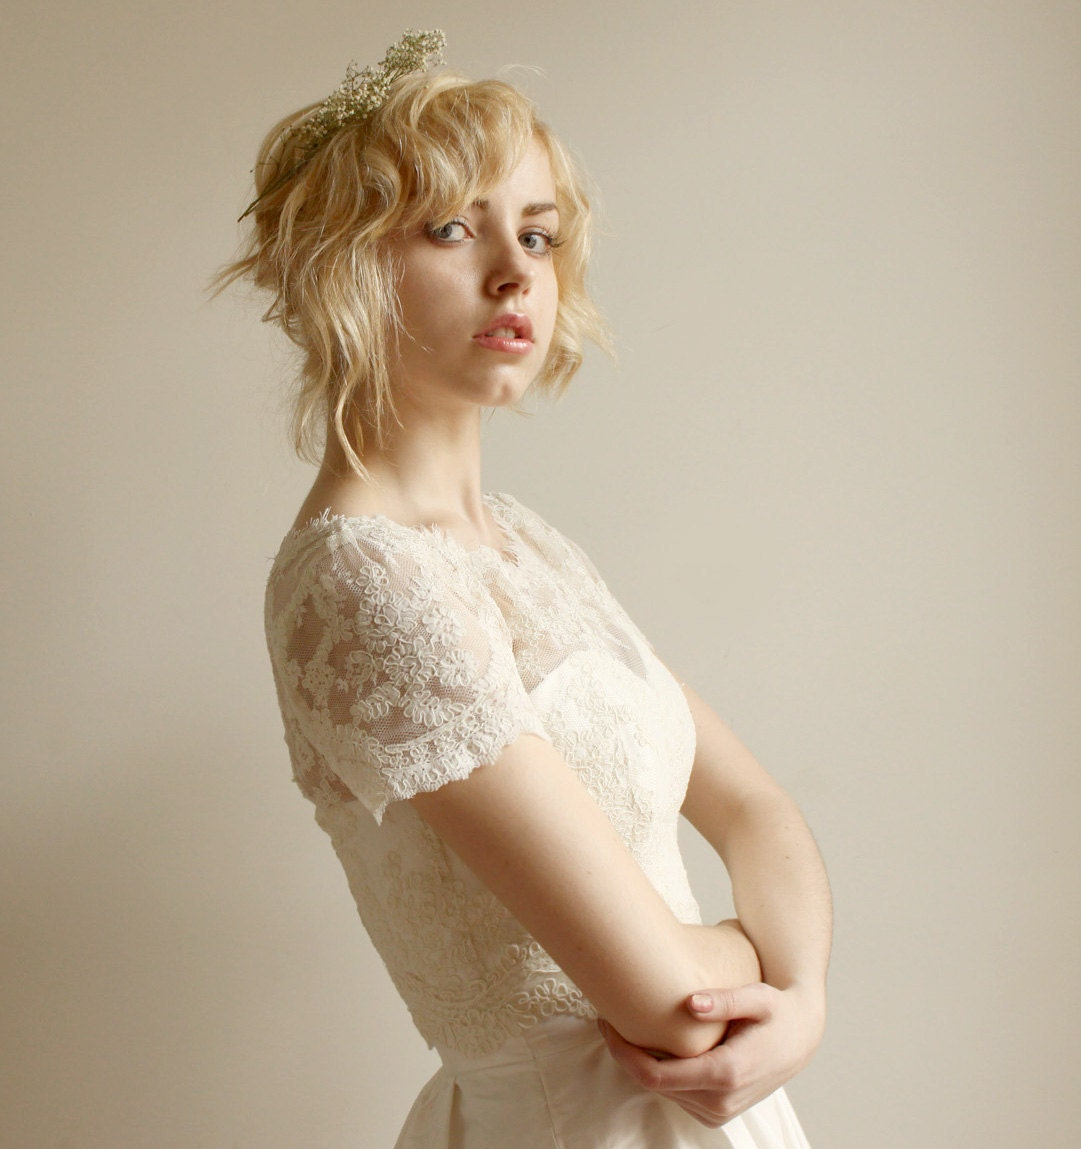 Elandra--Lace wedding top separate - Leanimal